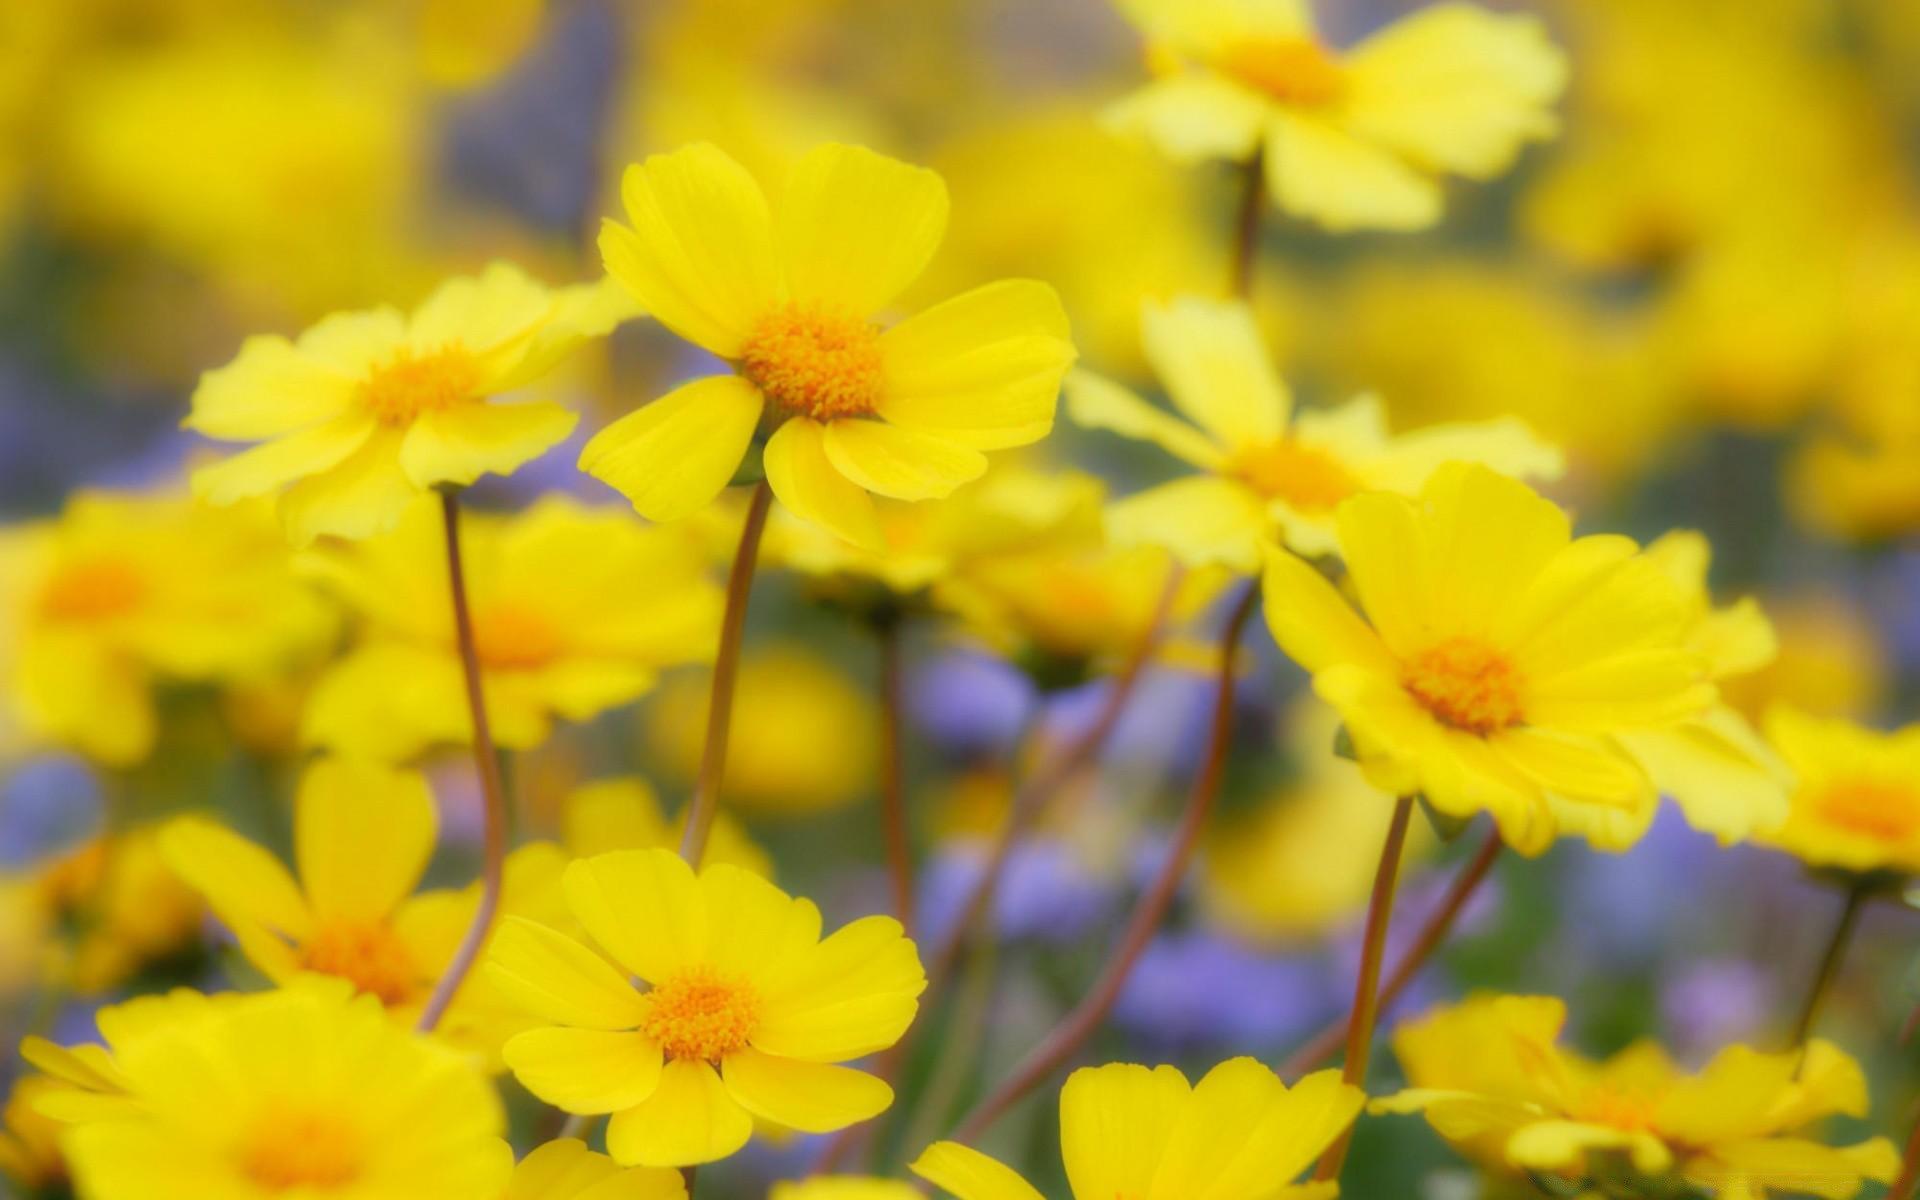 цветы желтые бесплатно